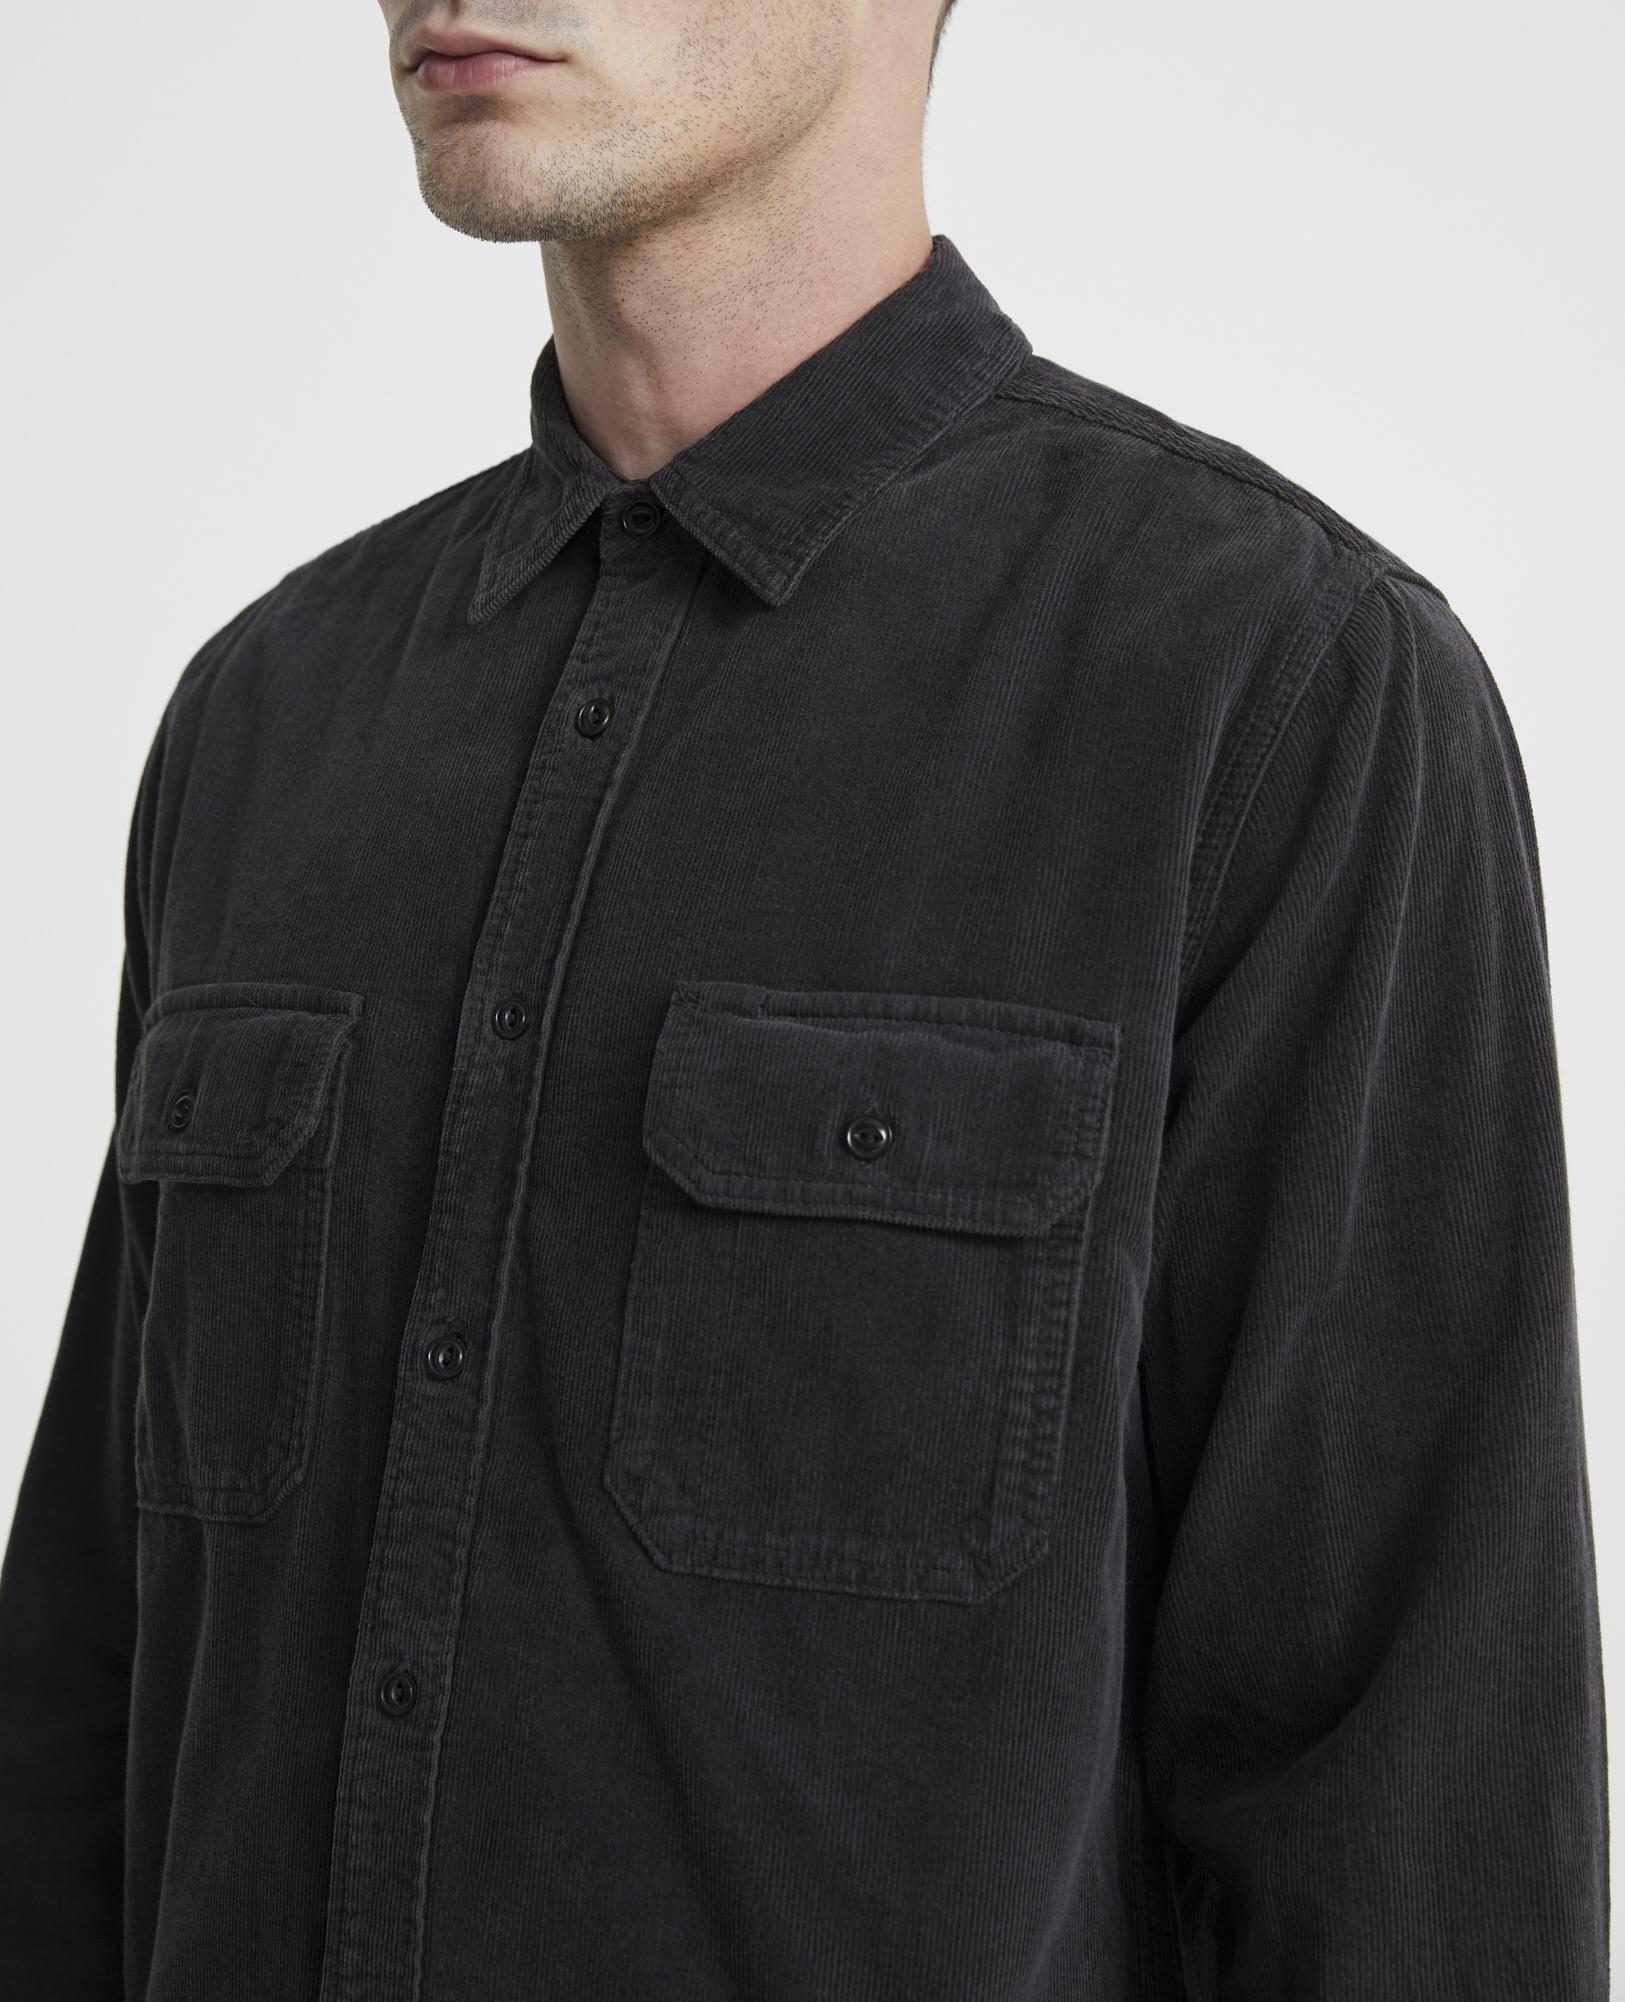 The Benning Utility Shirt